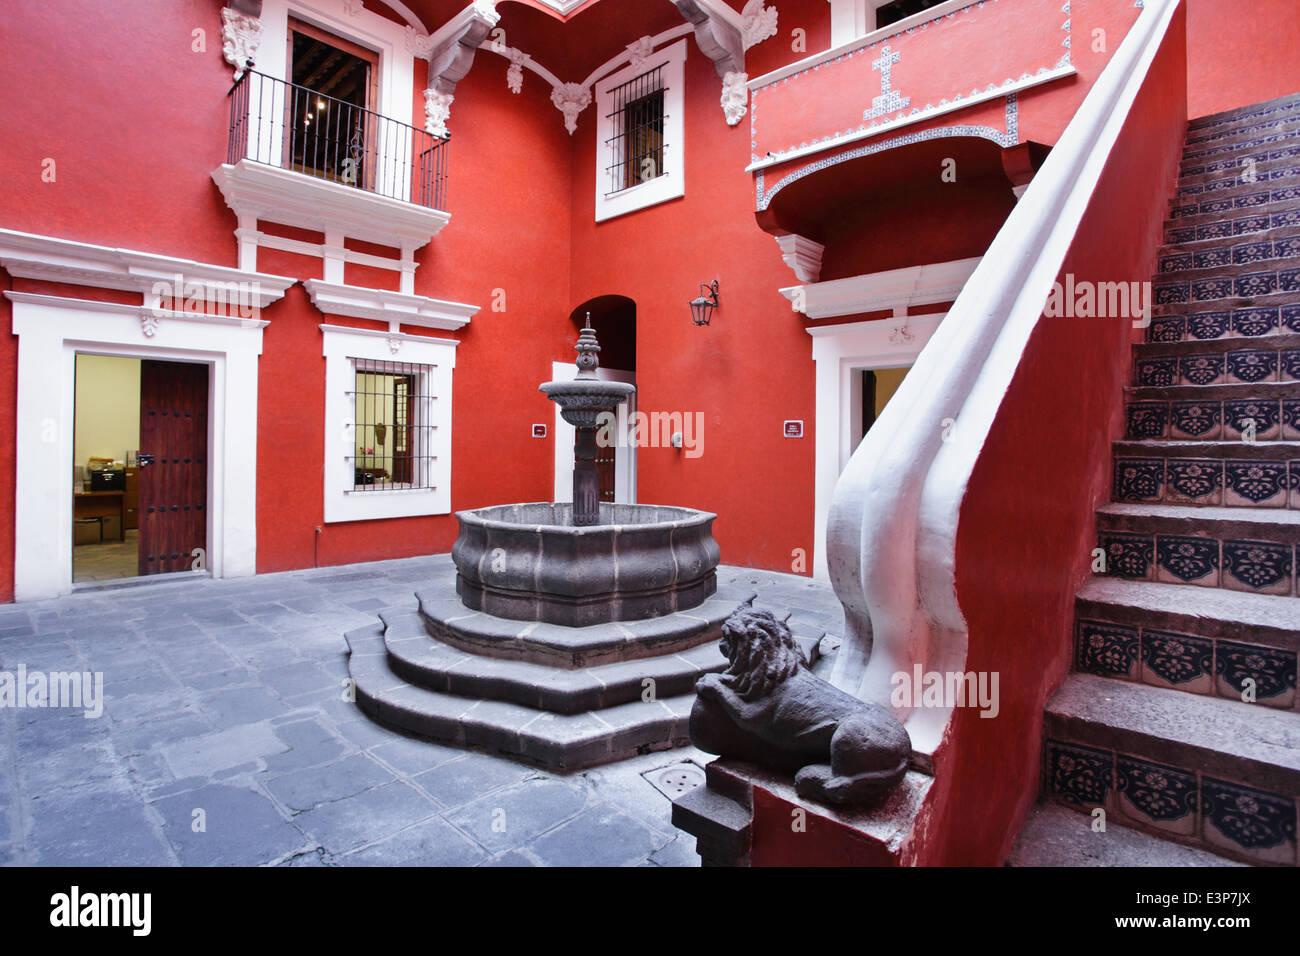 Terrasse des Casa del alfenique in Puebla, Mexiko. Stockbild